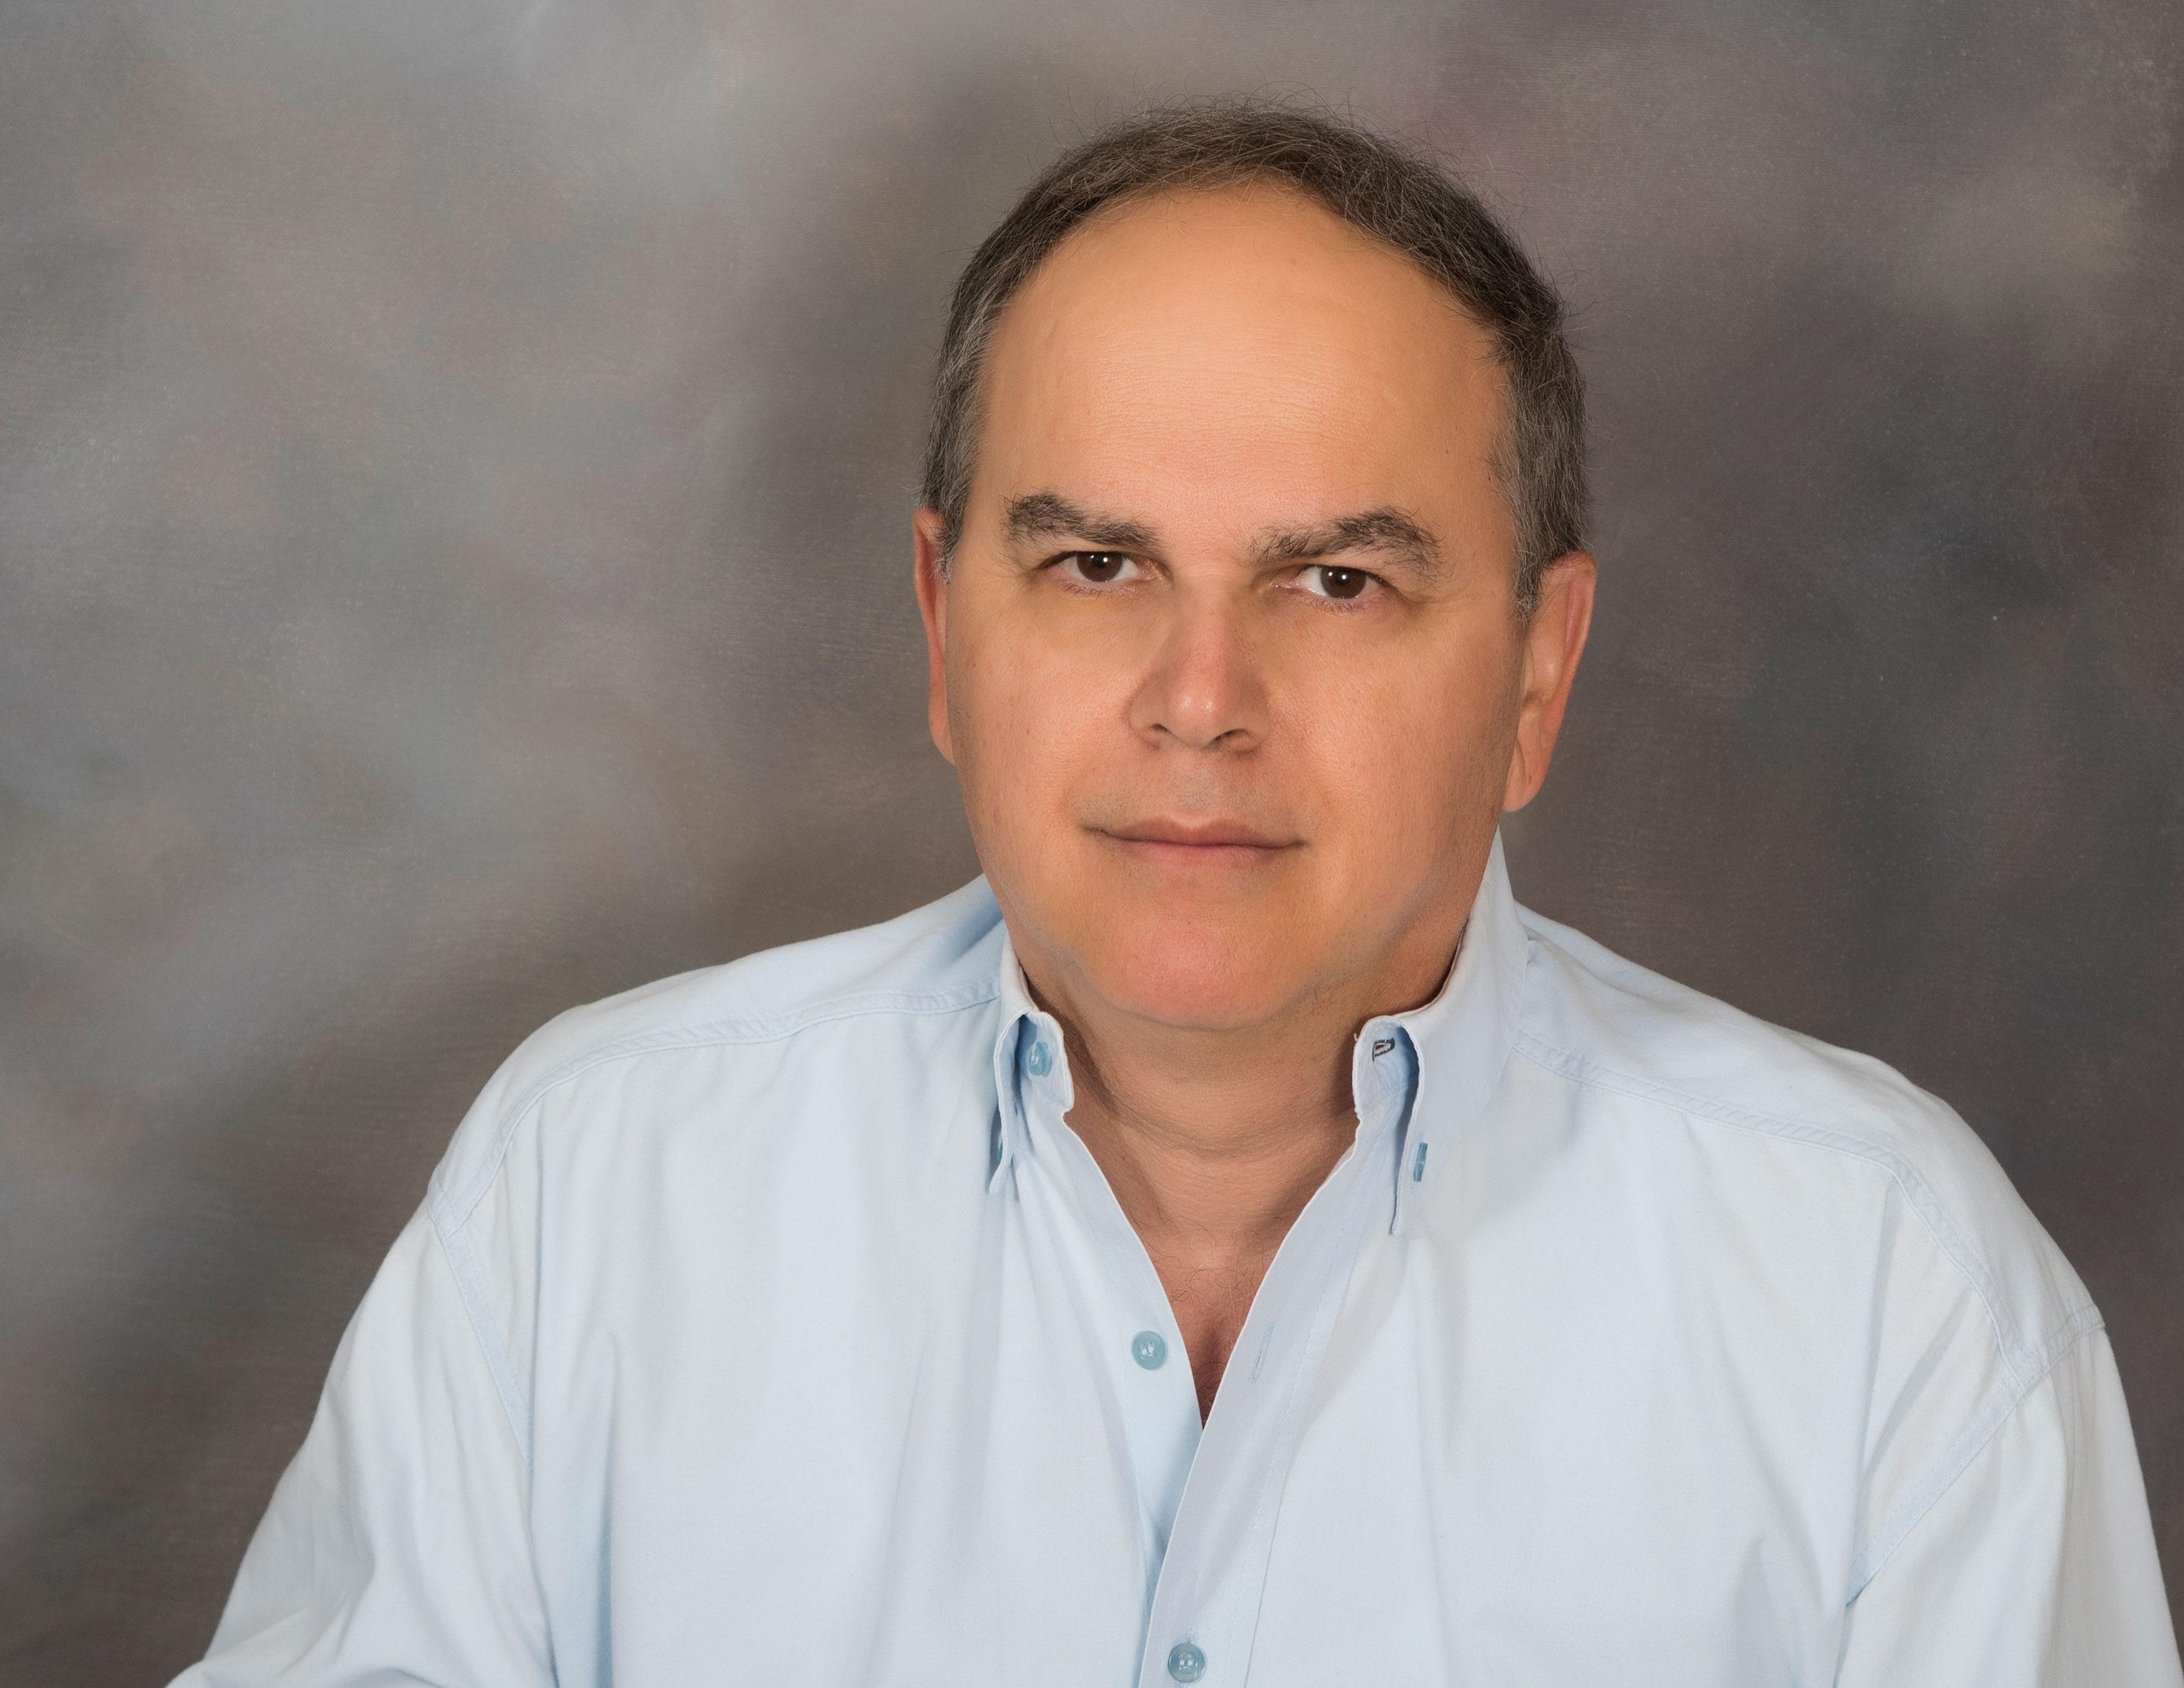 Lamprellis Dimitris